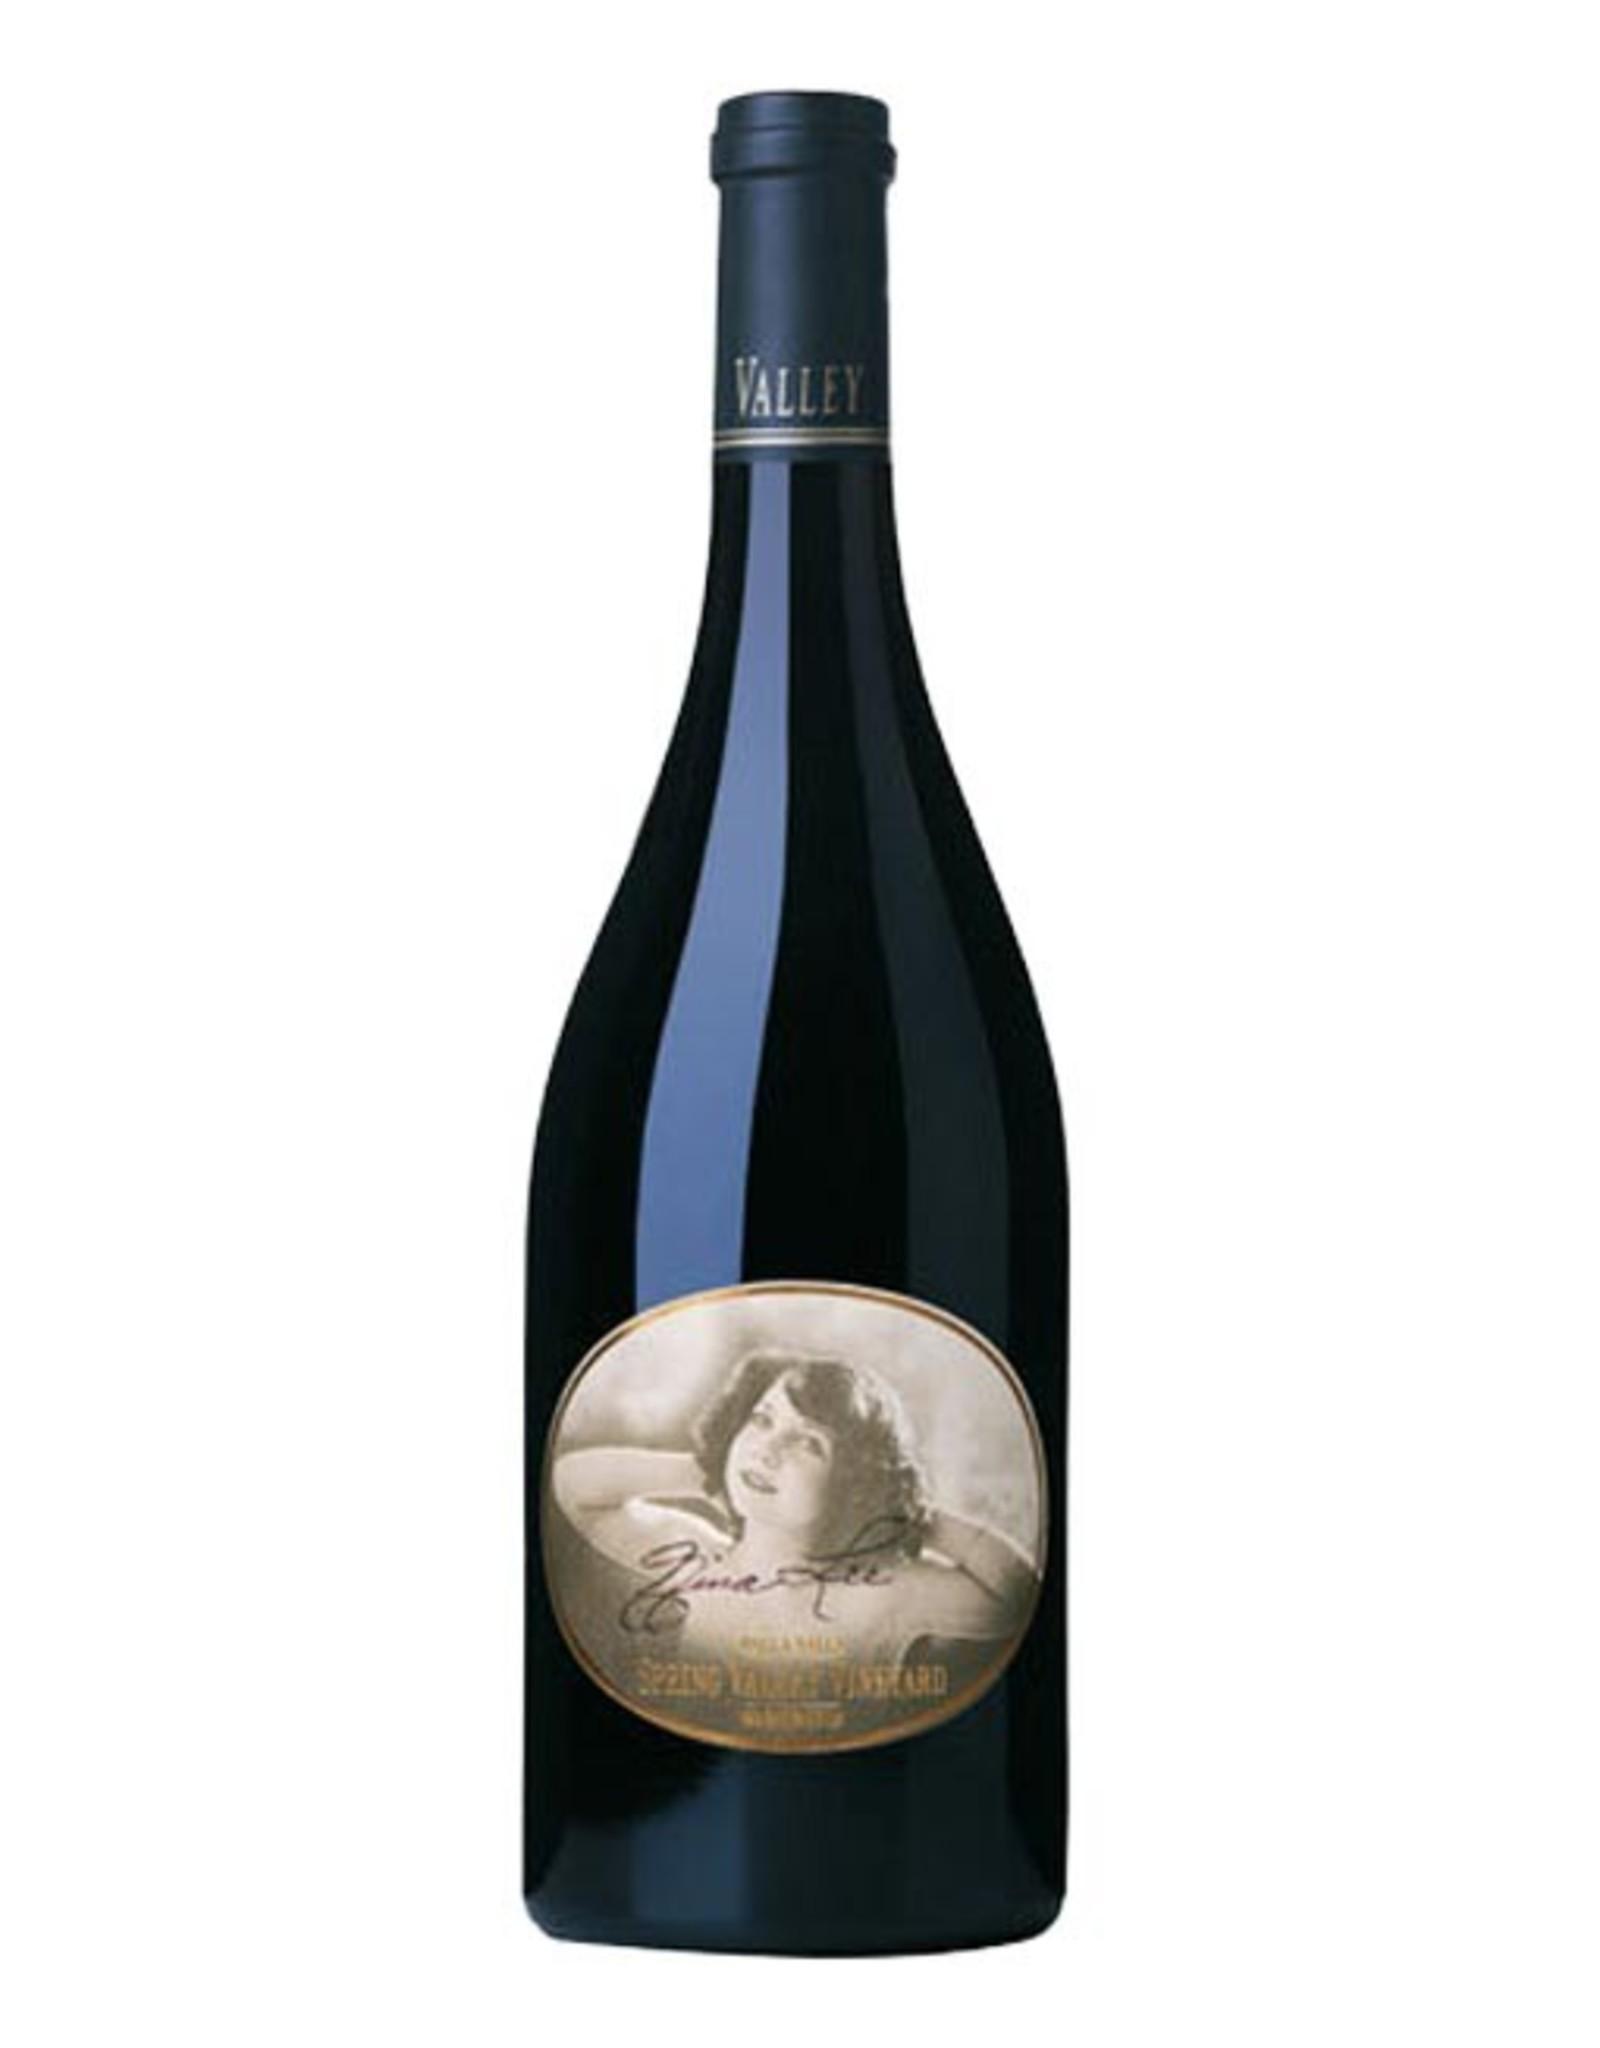 Red Wine 2011, Spring Valley Vineyard, Nina Lee, Syrah, Walla Walla, Columbia Valley, Washington, 14.8% Alc, CT91, TW92